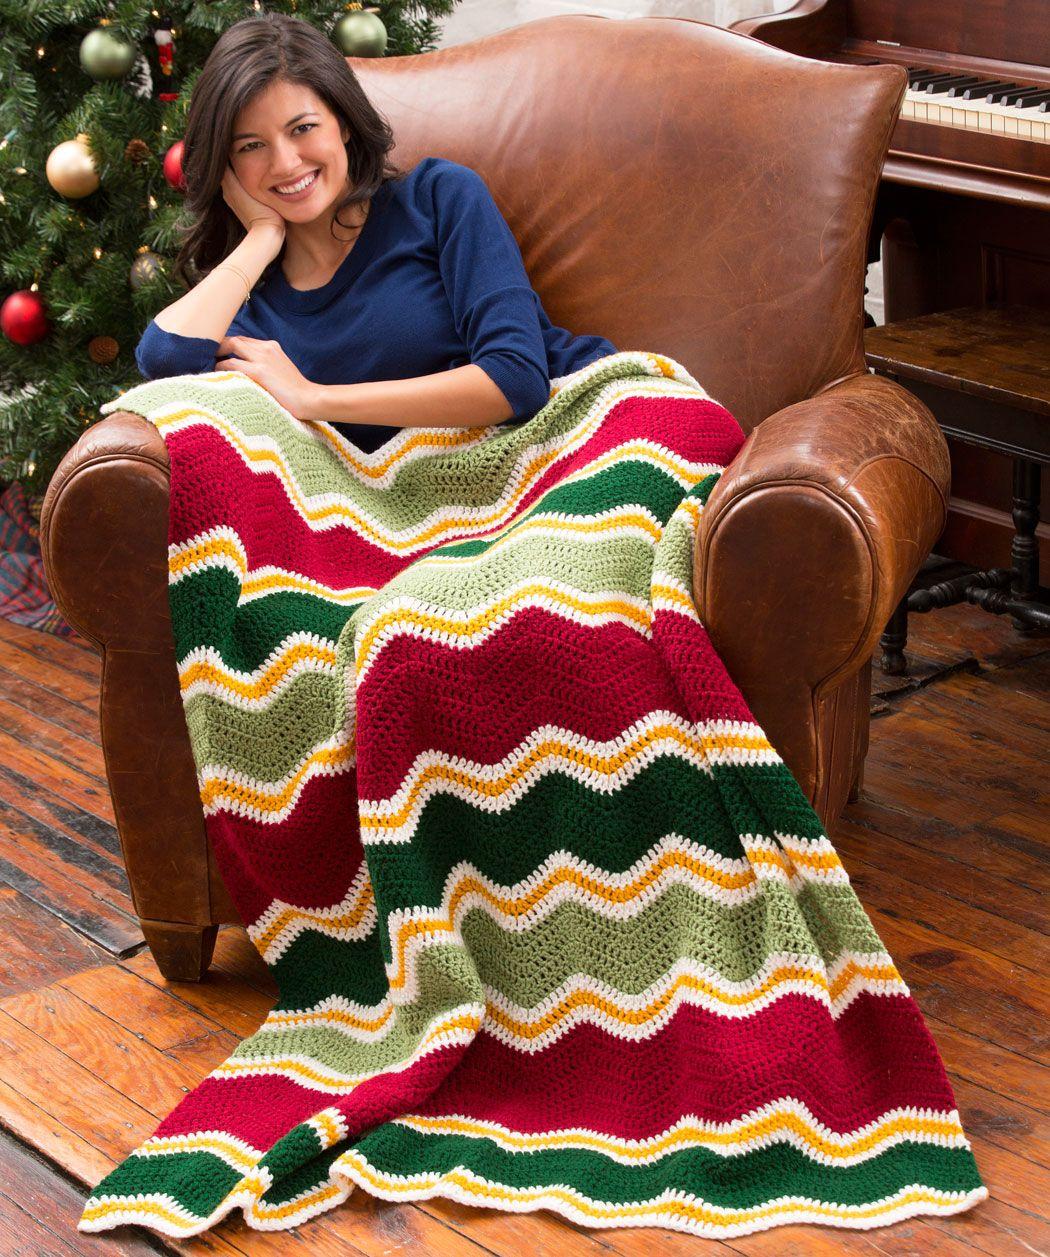 Holiday chevron throw free crochet pattern from red heart yarns holiday chevron throw free crochet pattern from red heart yarns bankloansurffo Choice Image